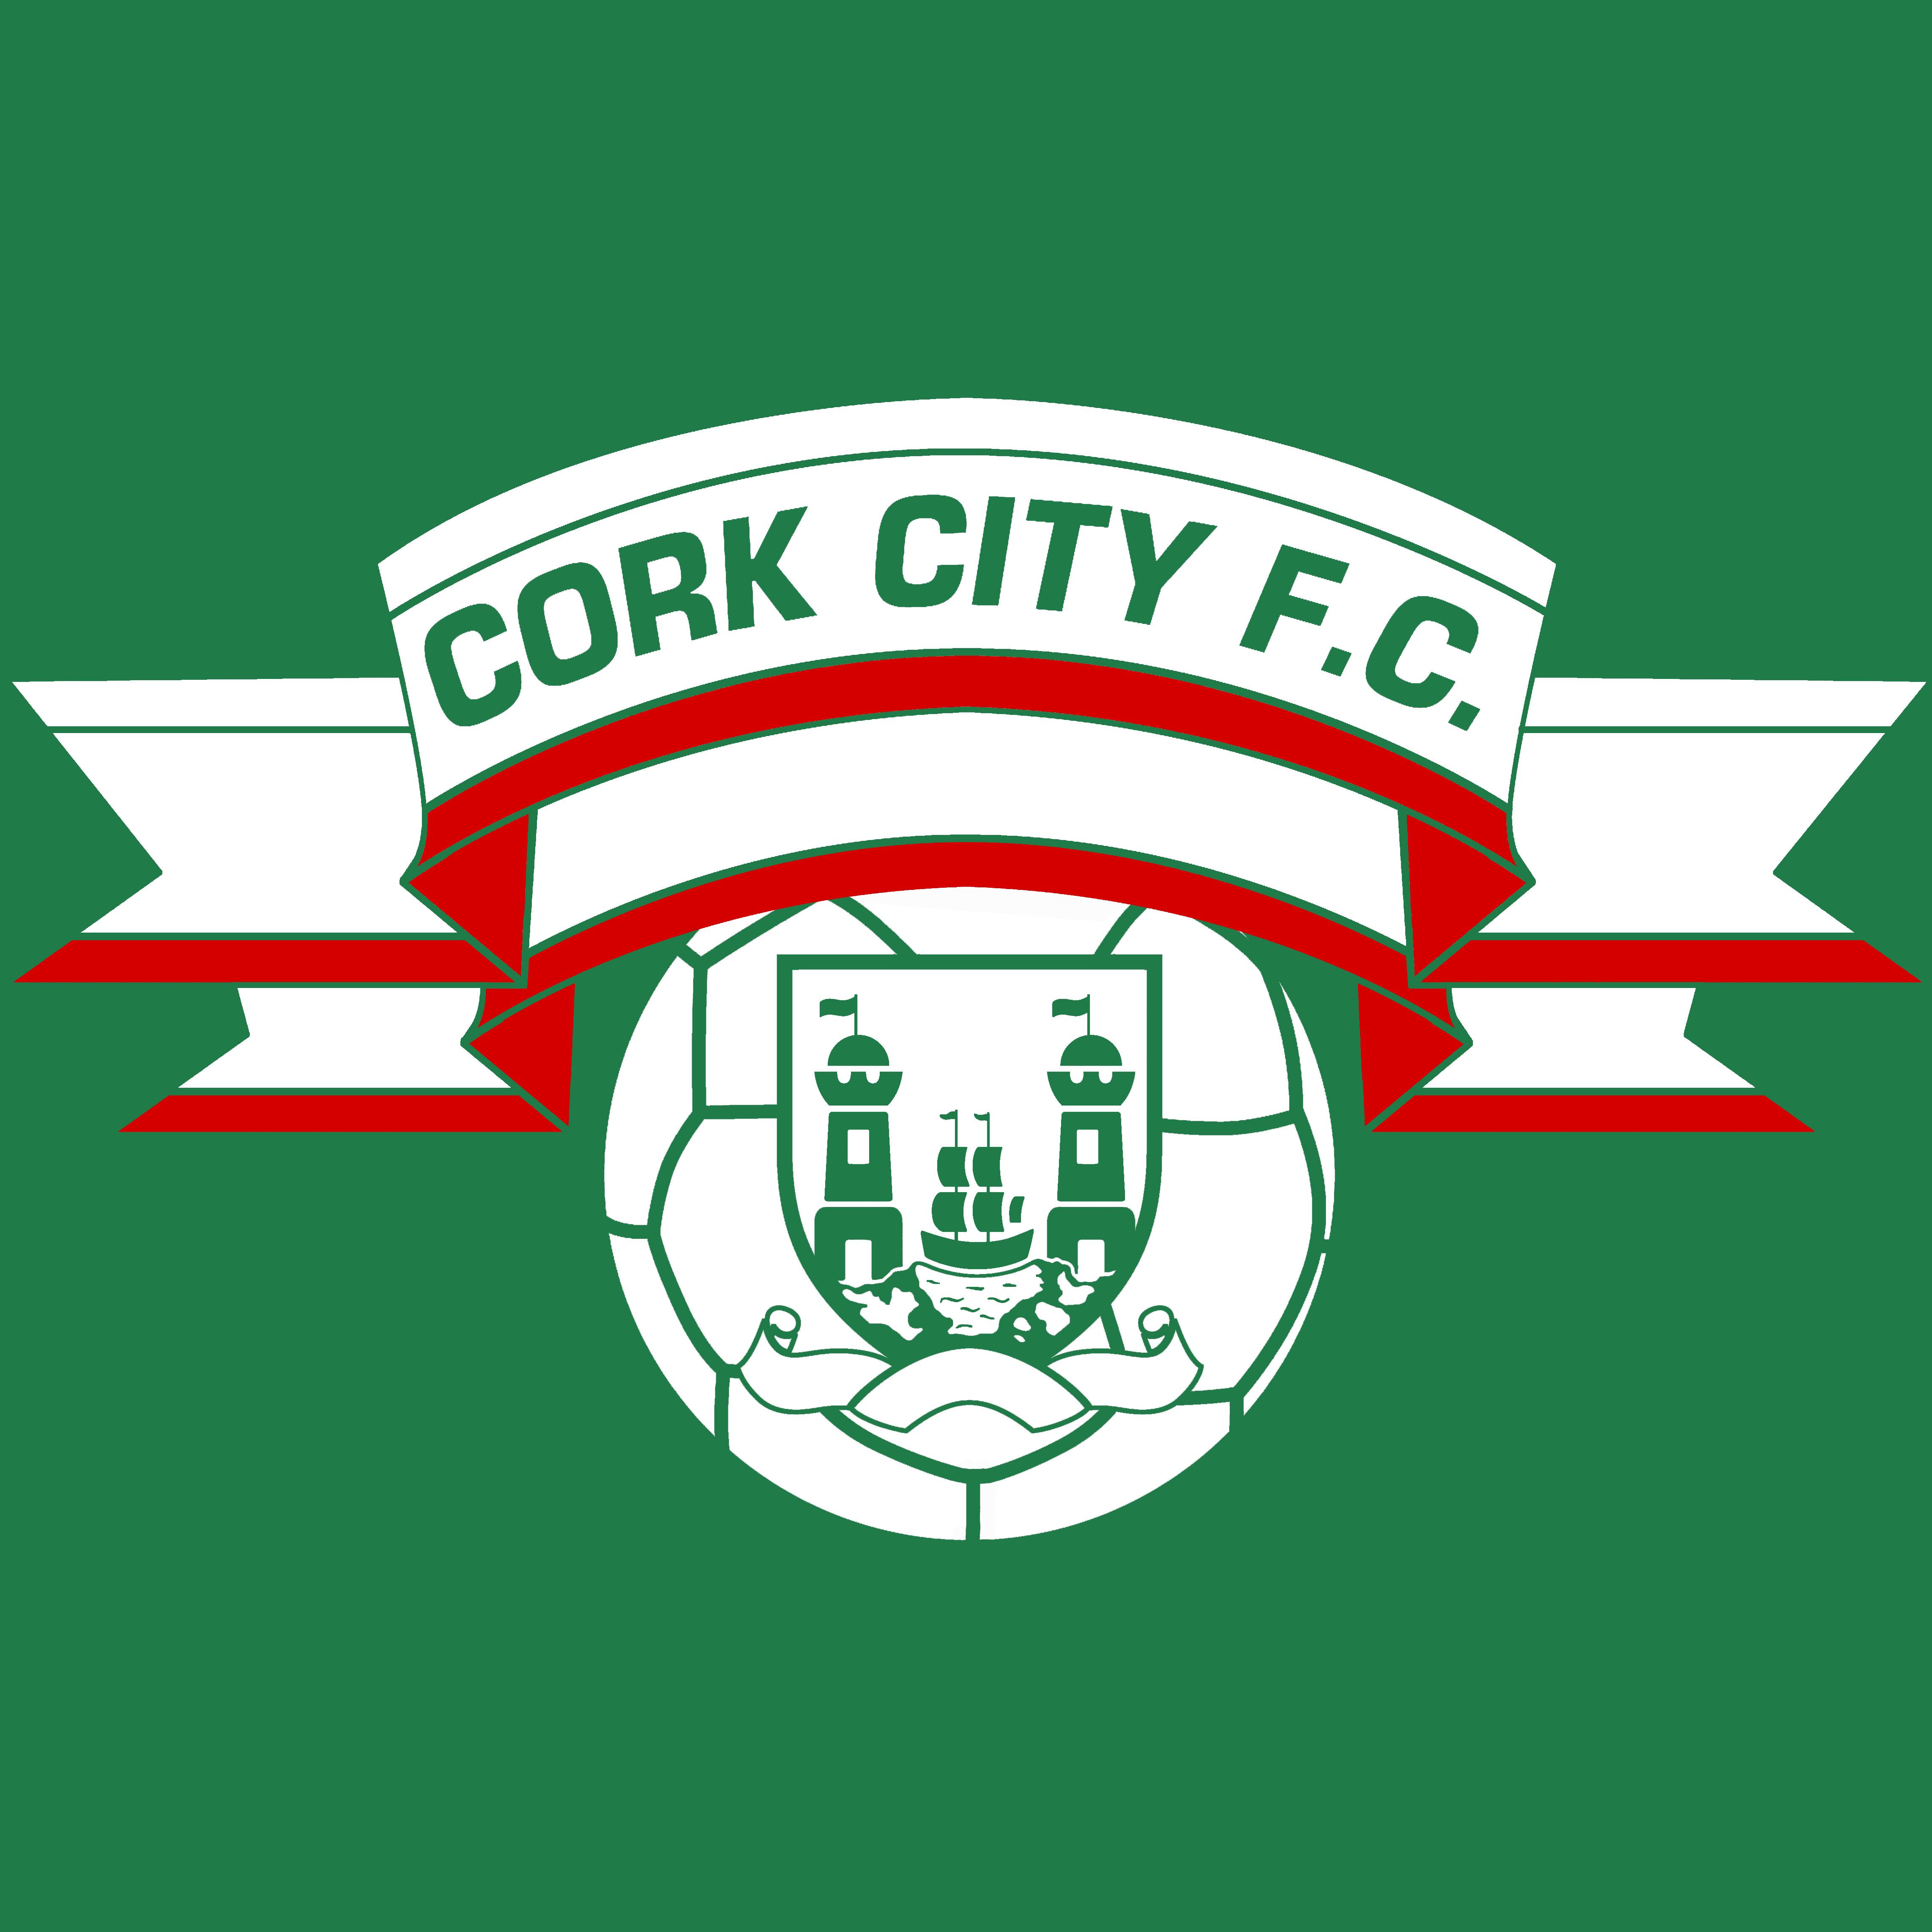 Cork City FC Crest History | 4570 x 4570 jpeg 2616kB